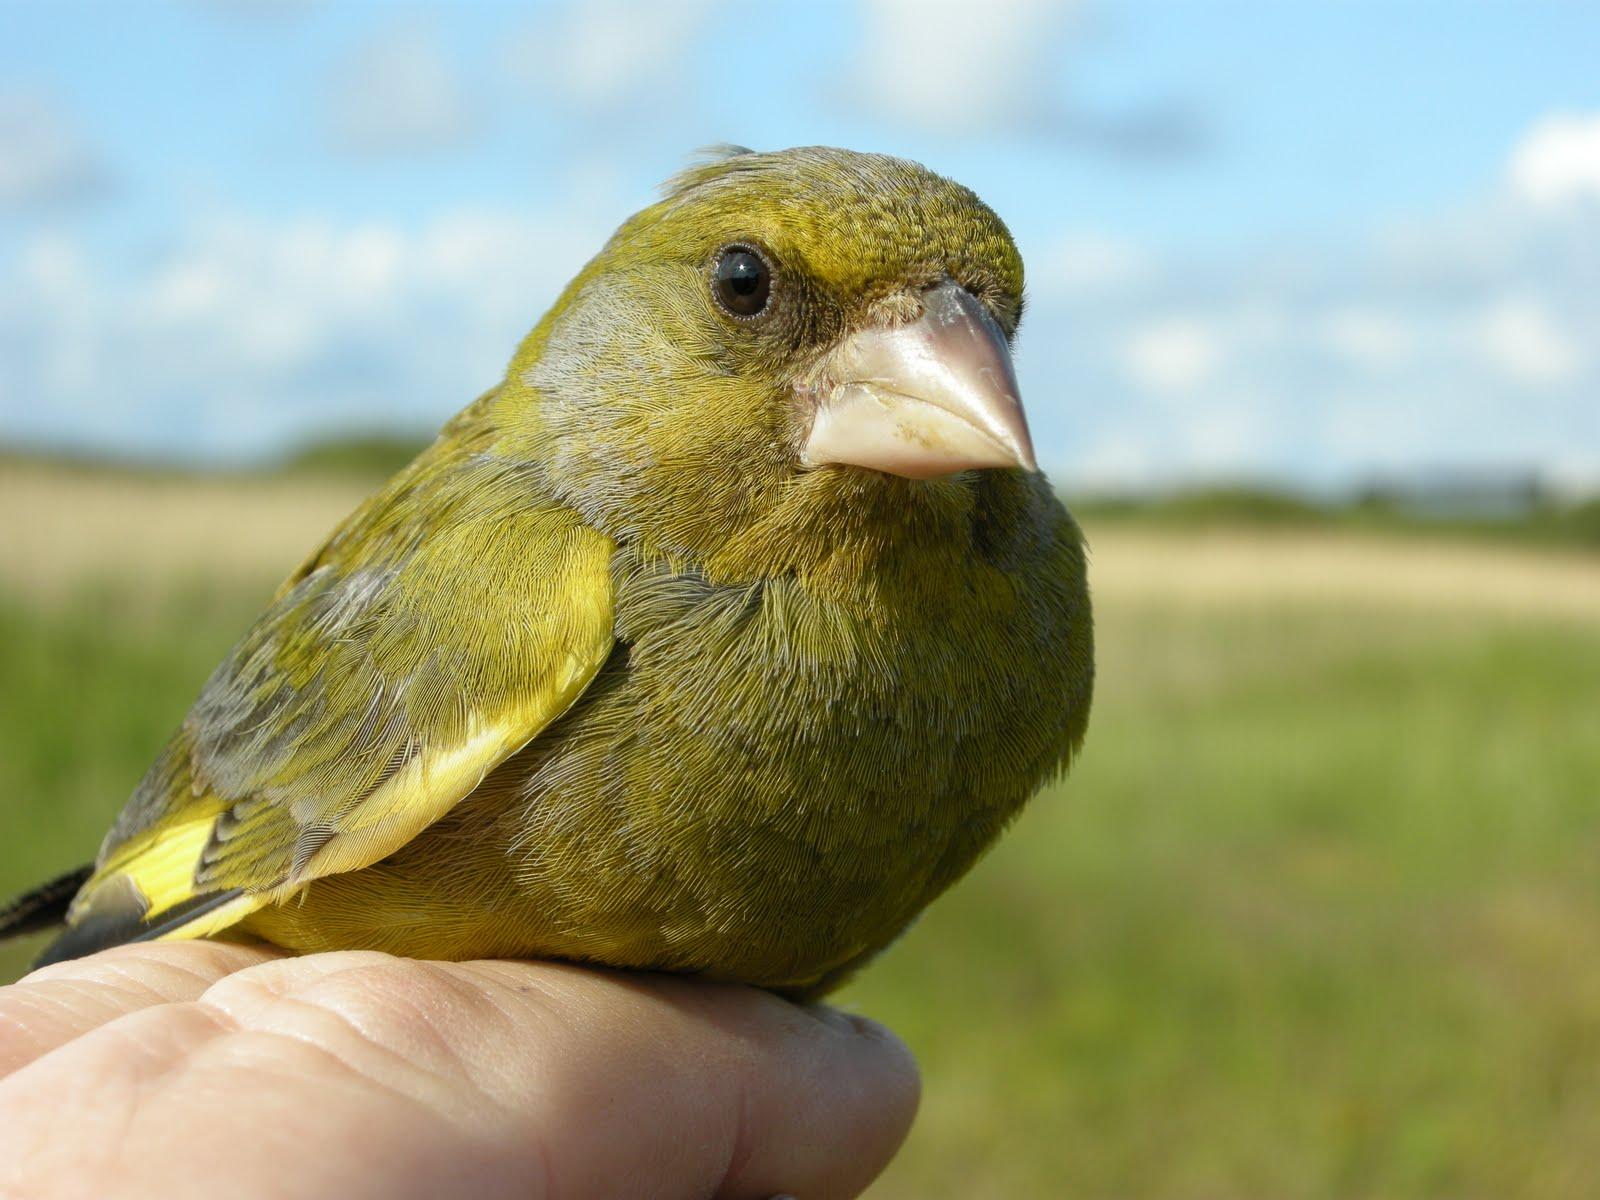 Greenfinch | British Wildlife Wiki | FANDOM powered by Wikia